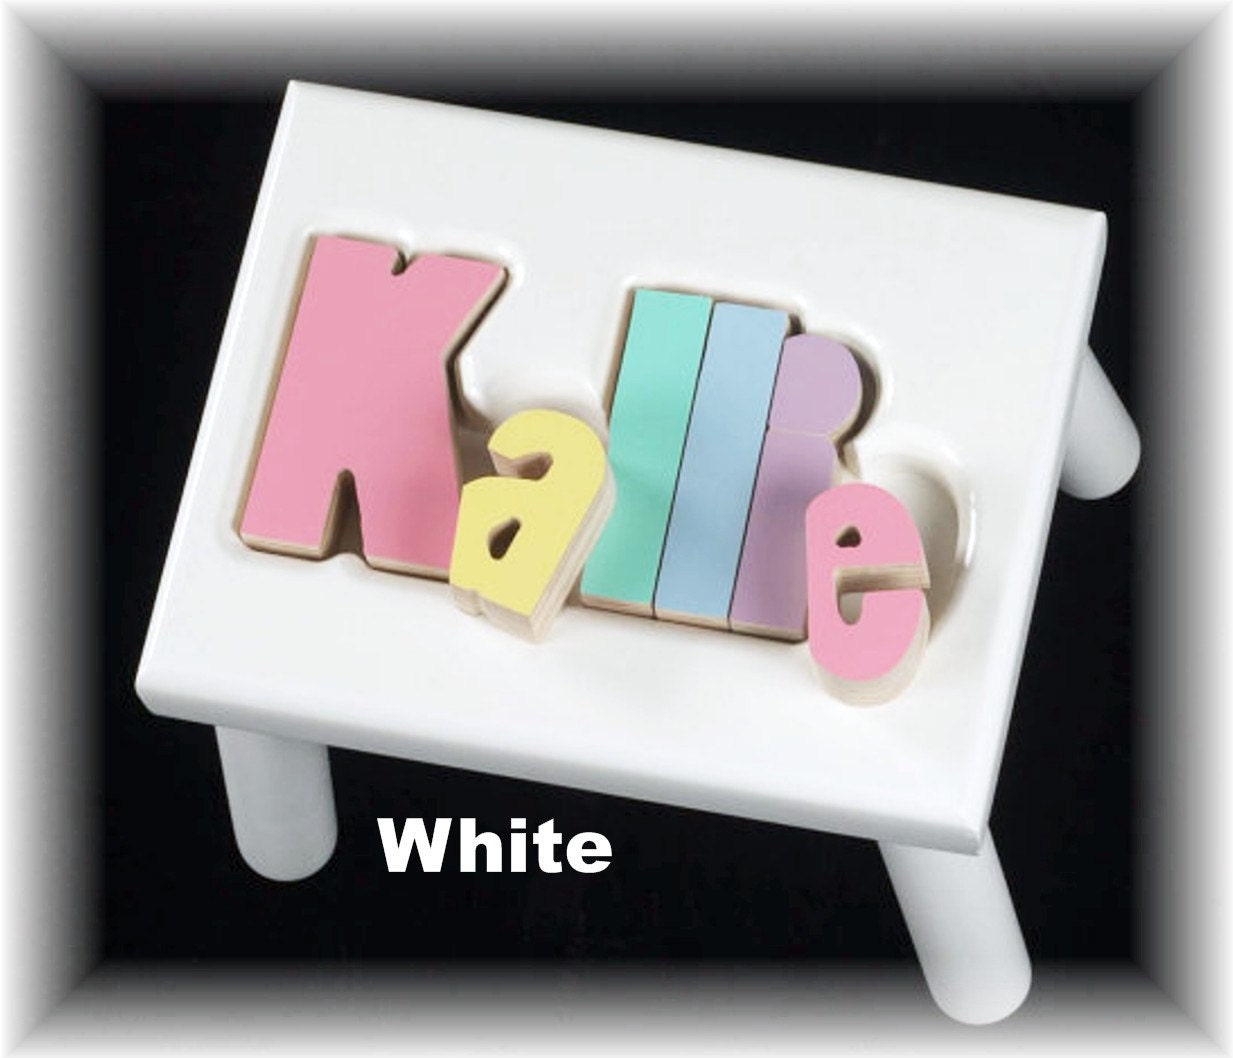 White Name Puzzle Stools